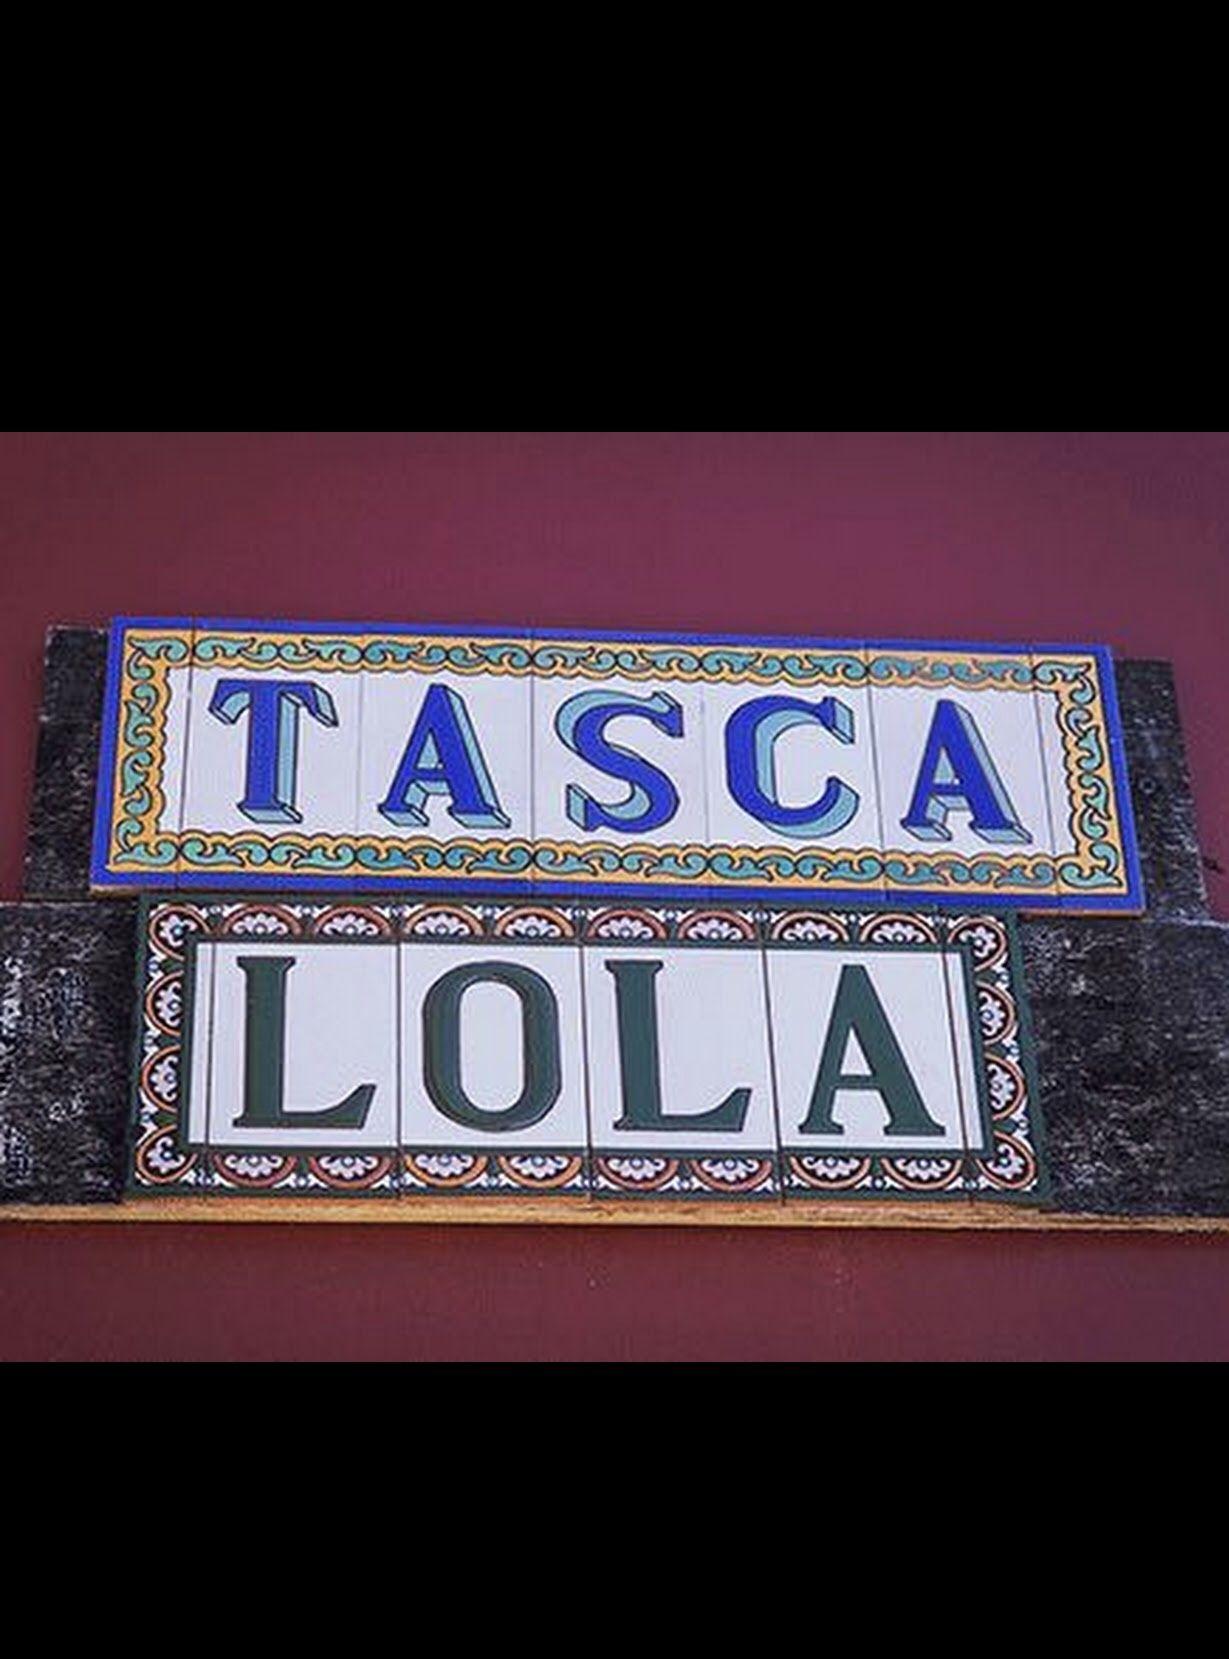 Tasca de Lola